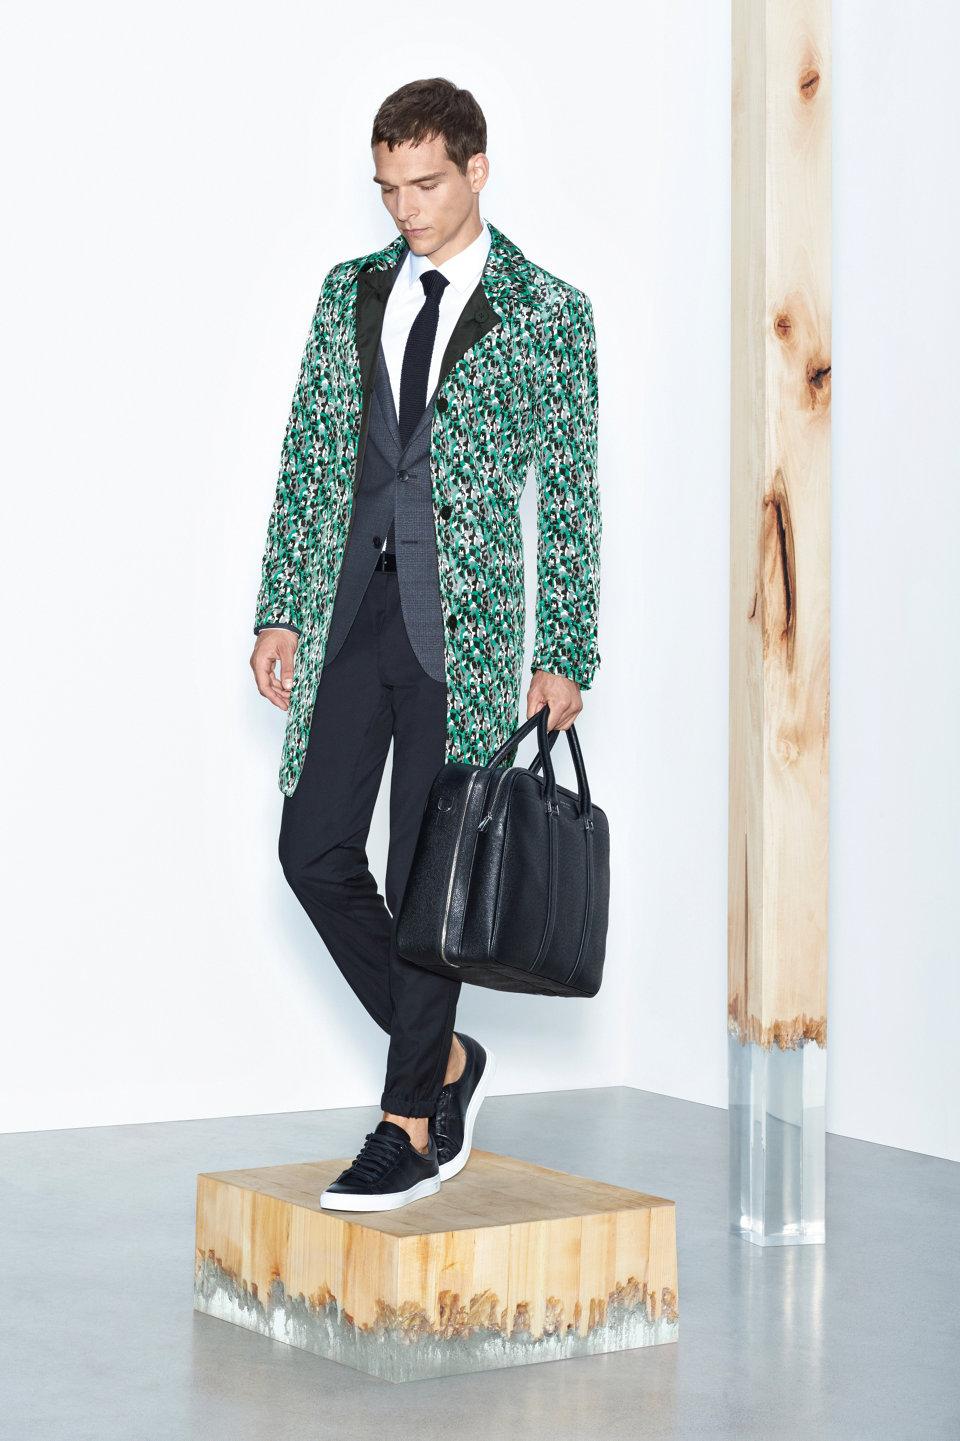 Mantel in een zwart-groen dessinvanBOSS